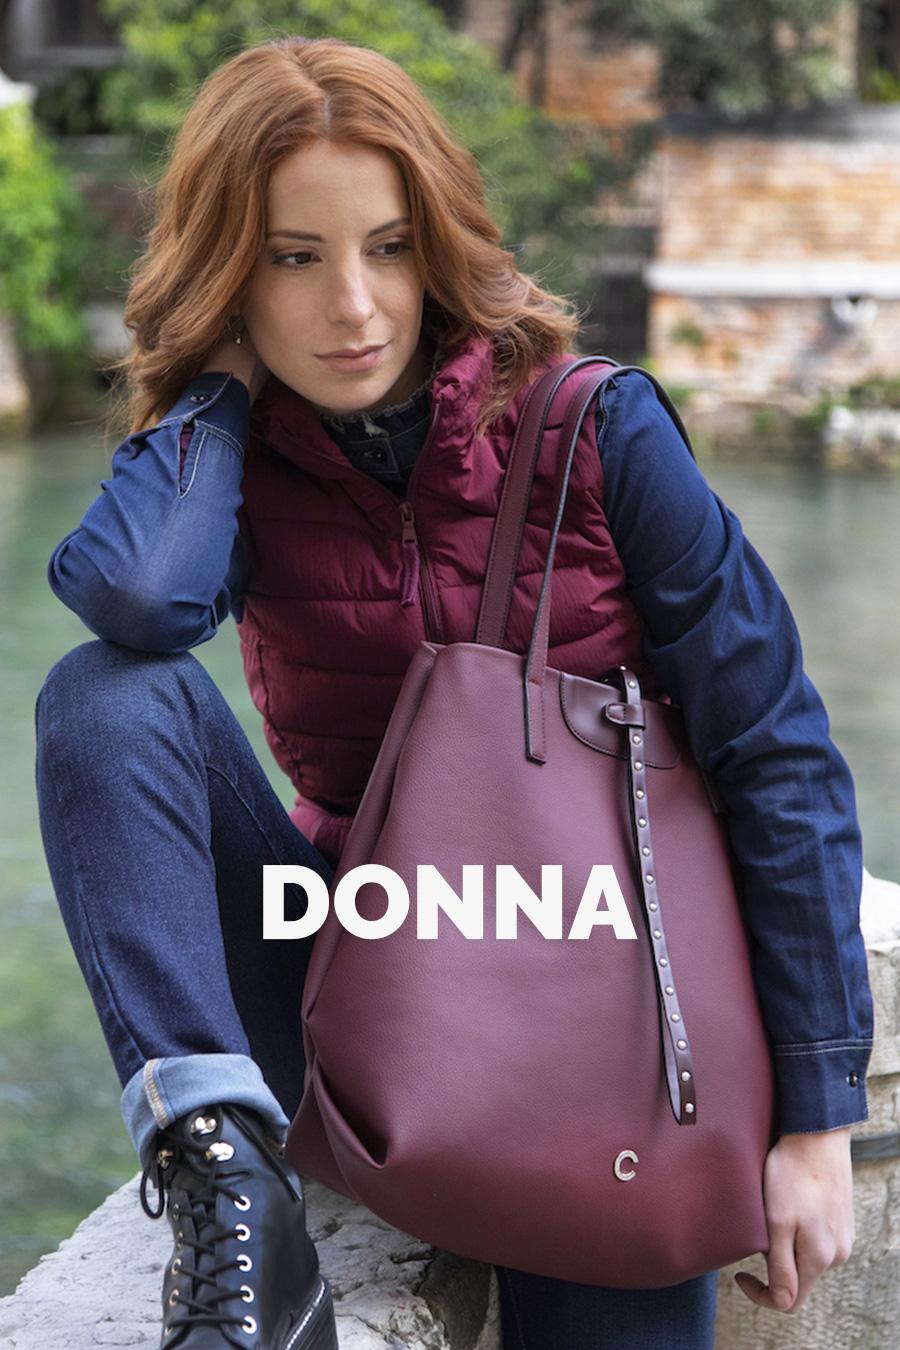 carrera-donna-nov19